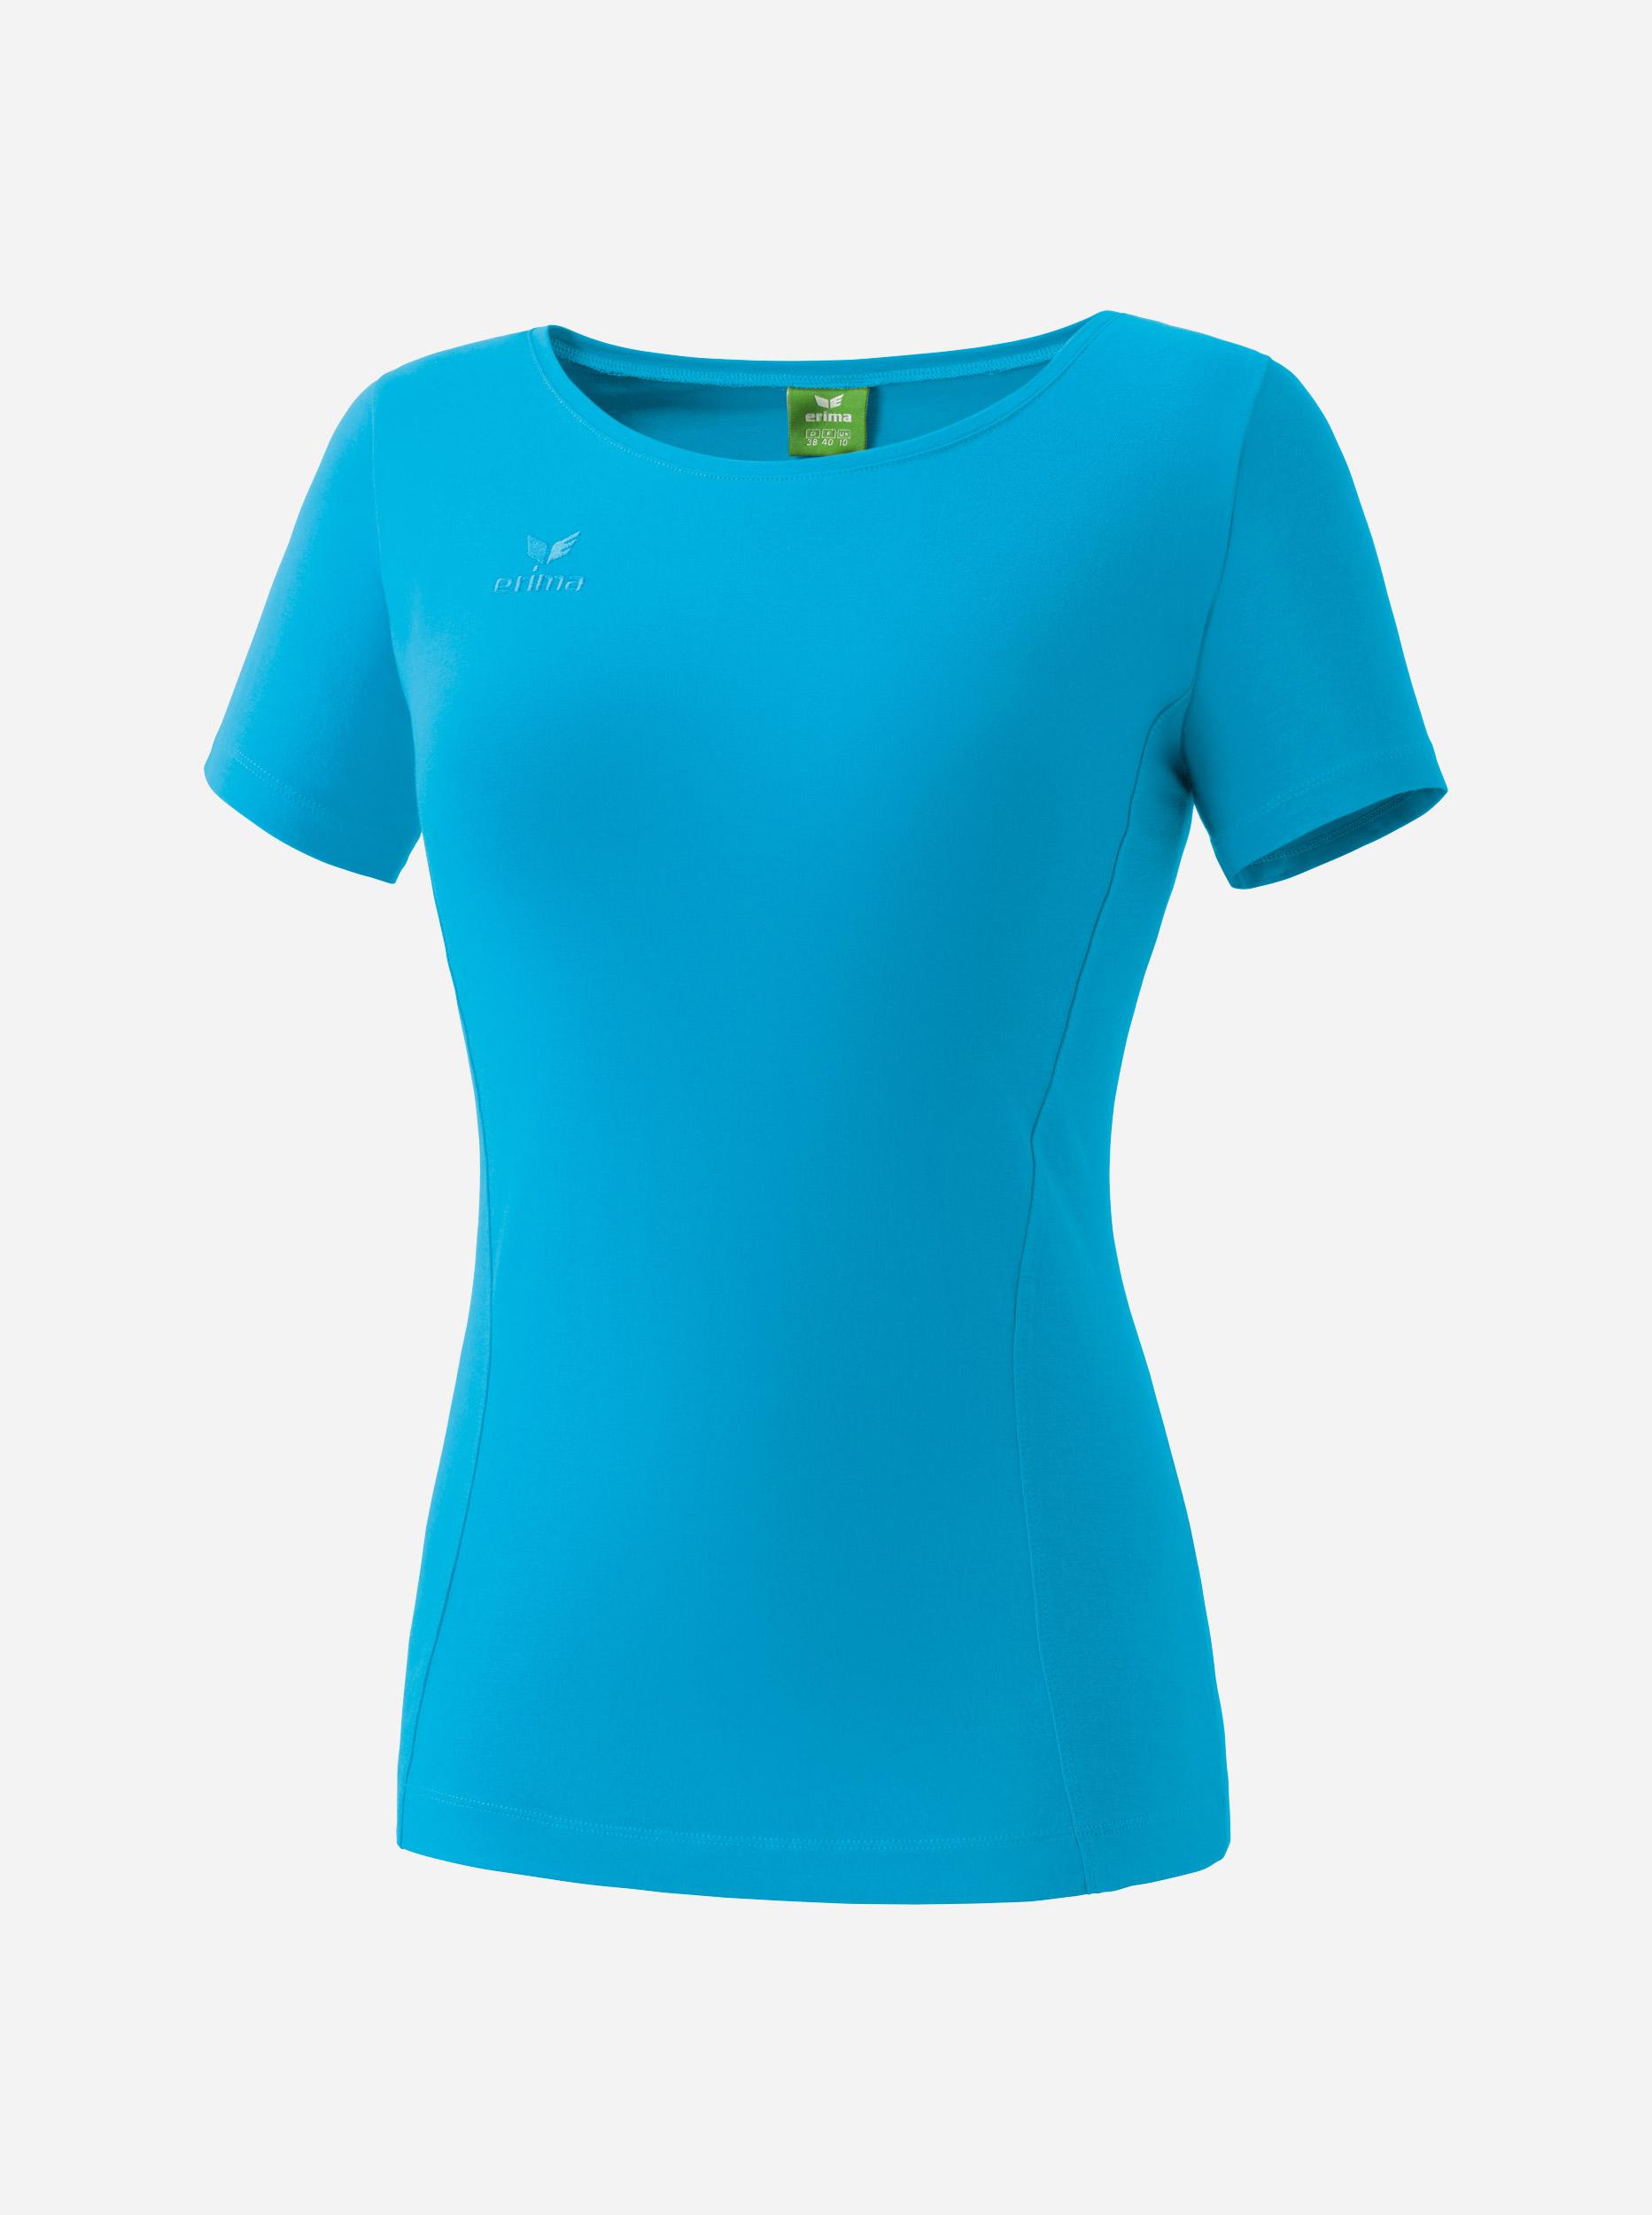 Damen T-Shirt Style